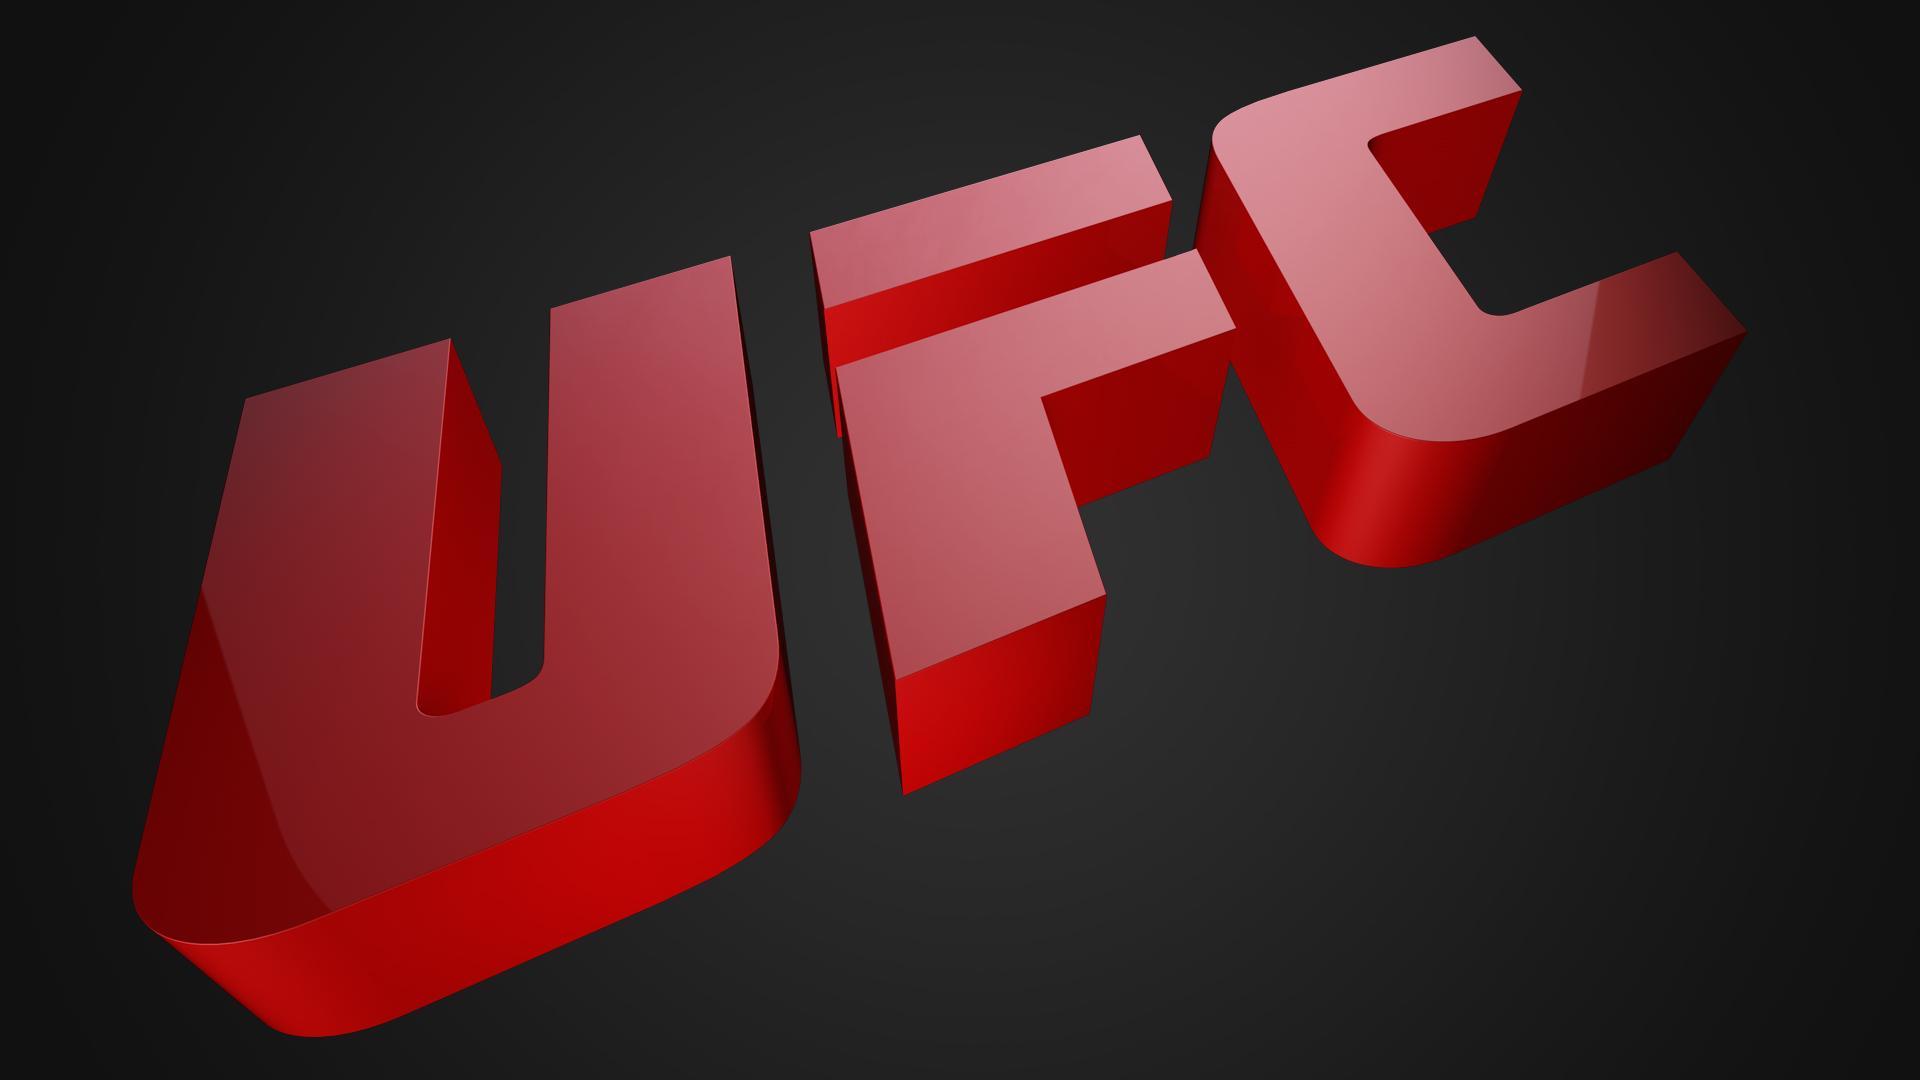 UFC_StyleFrameV2_Frame13_V2.jpg